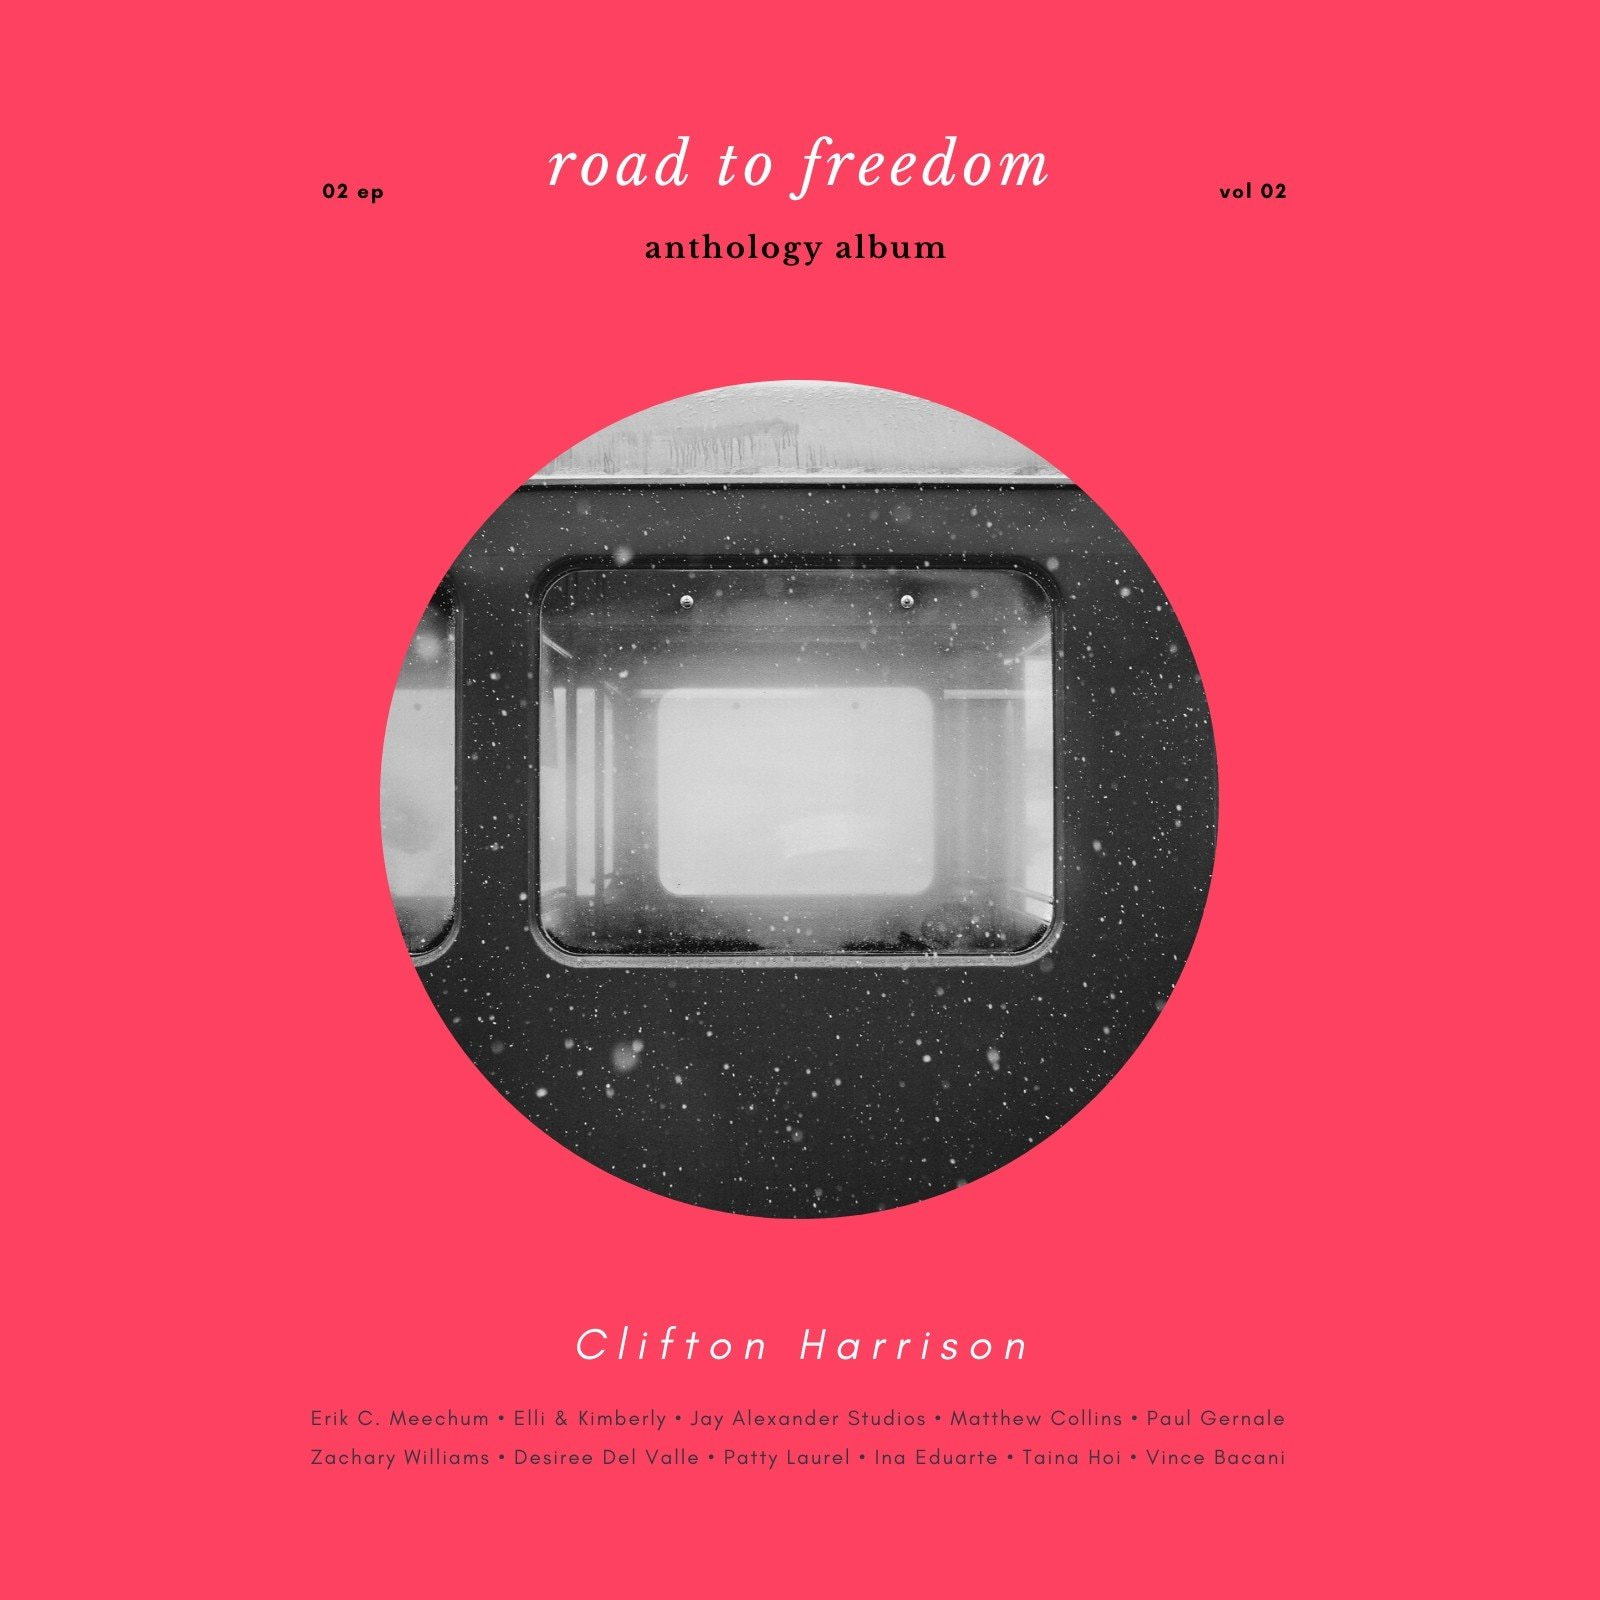 Red Modern Album Cover